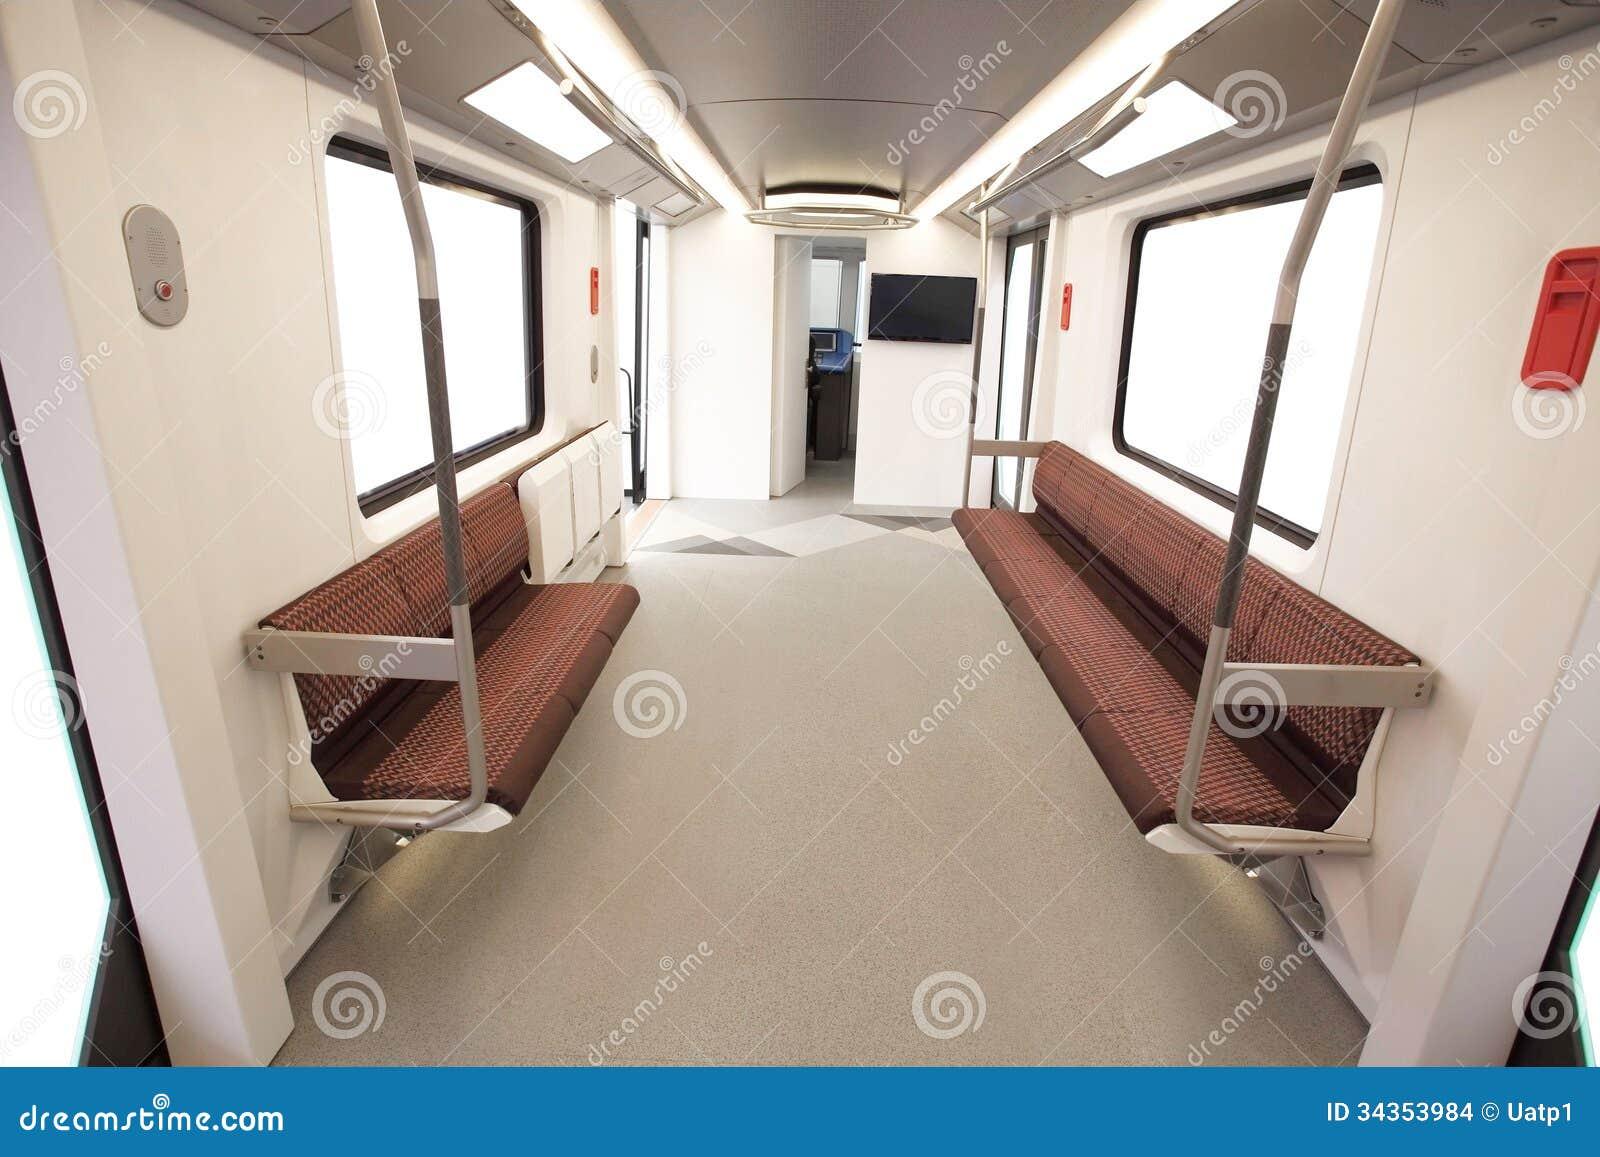 Metro carriage stock images image 34353984 - Carrage metro ...